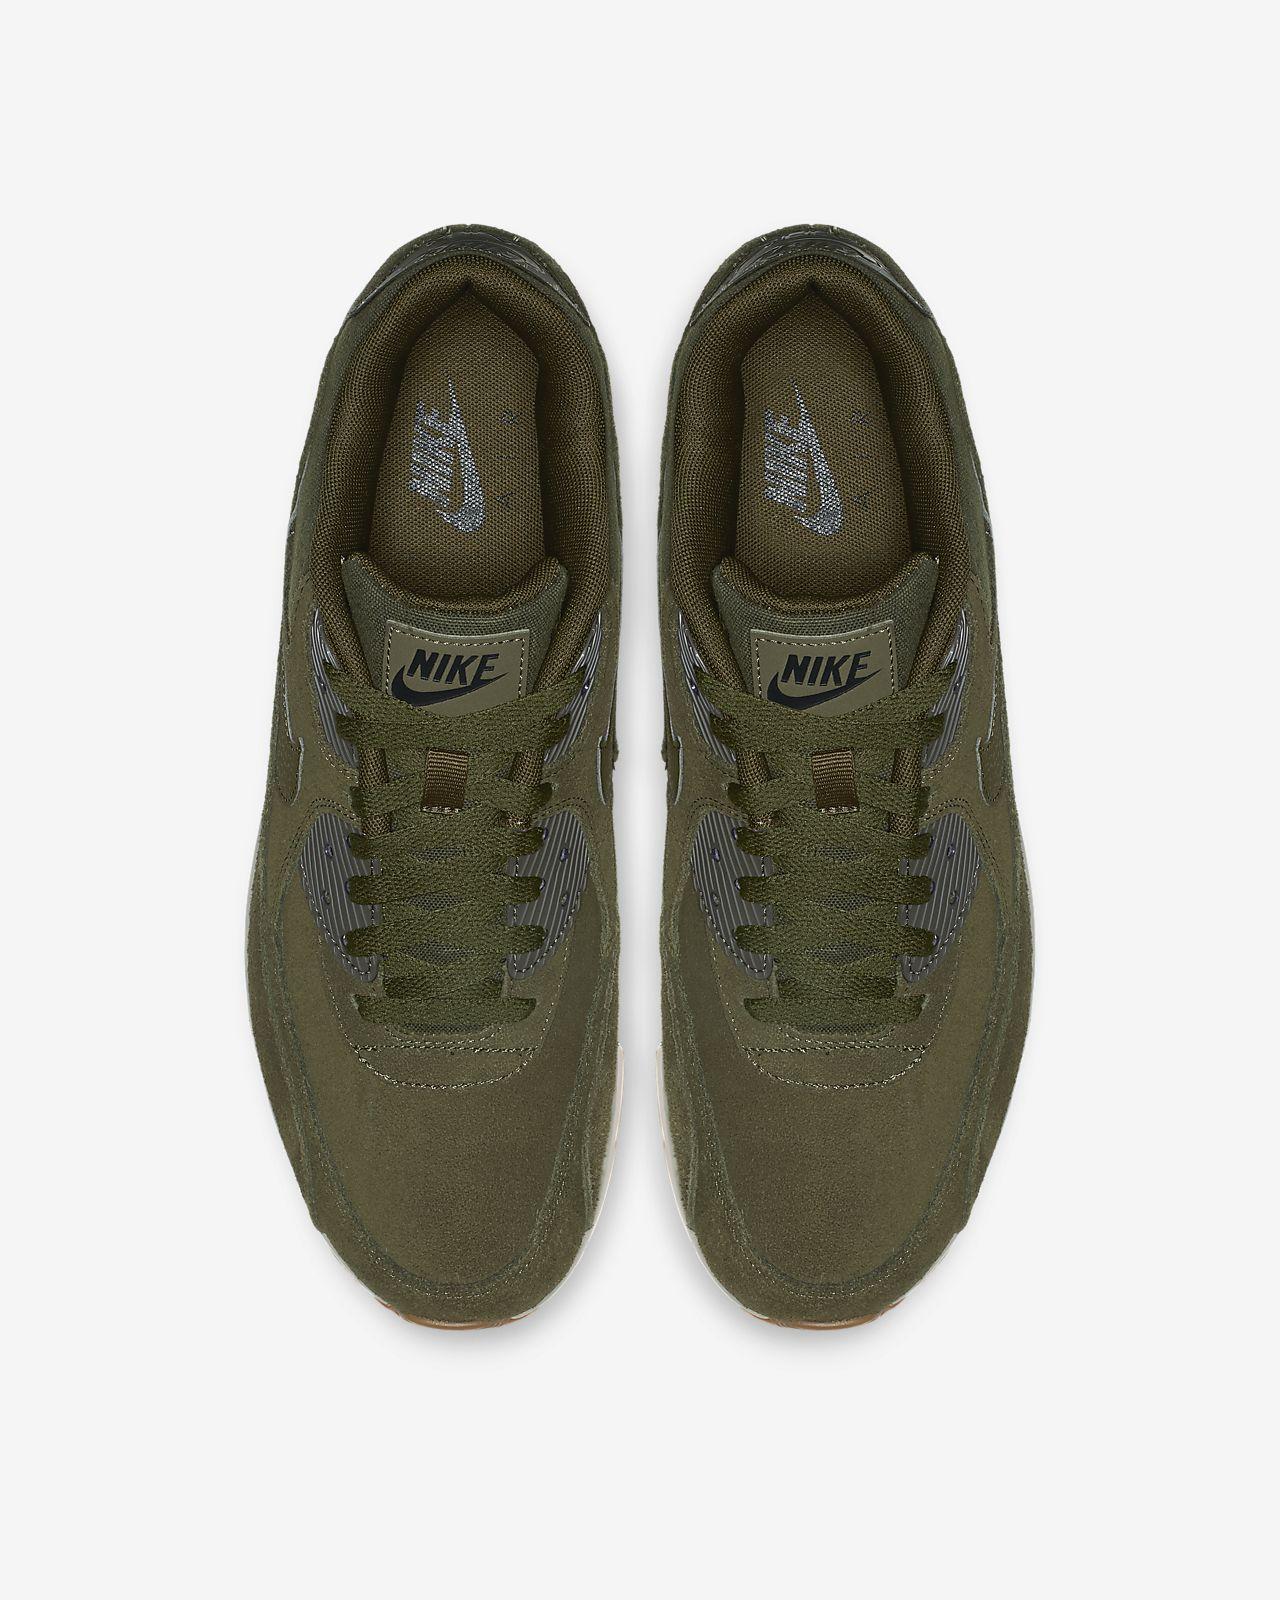 wholesale dealer d464e b22a6 ... Nike Air Max 90 Ultra 2.0 Men s Shoe